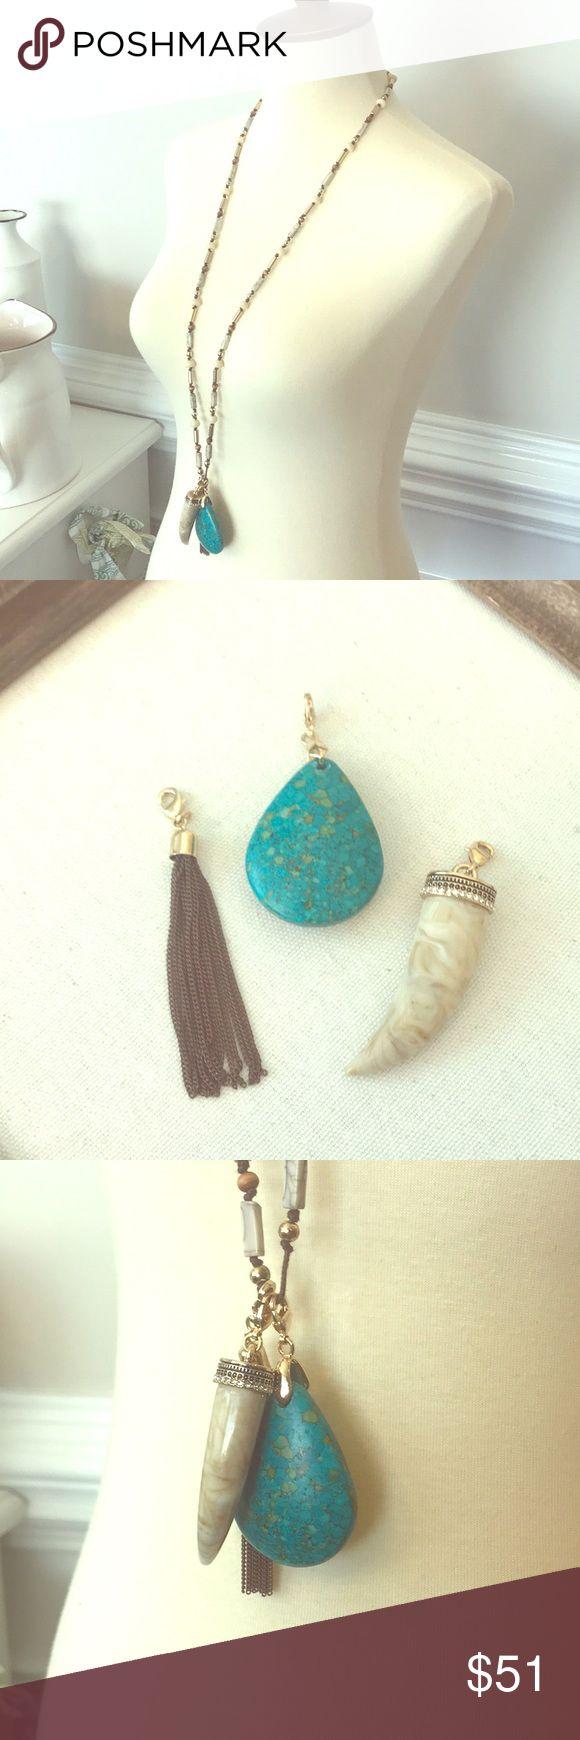 Rustic Diva necklace | Premier designs jewelry, Matte gold ...